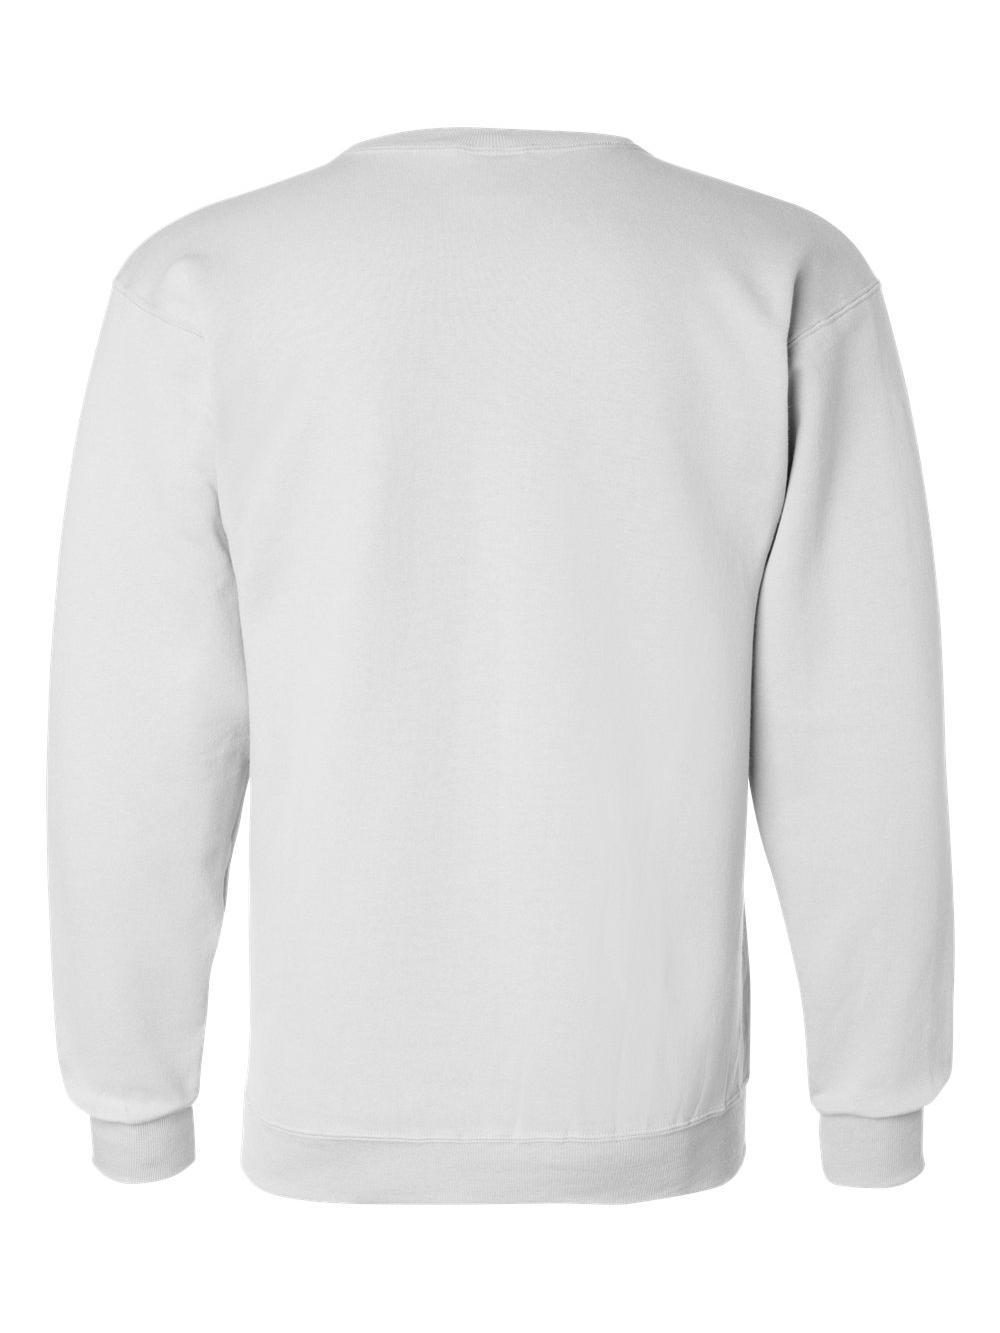 Champion-Double-Dry-Eco-Crewneck-Sweatshirt-S600 thumbnail 37